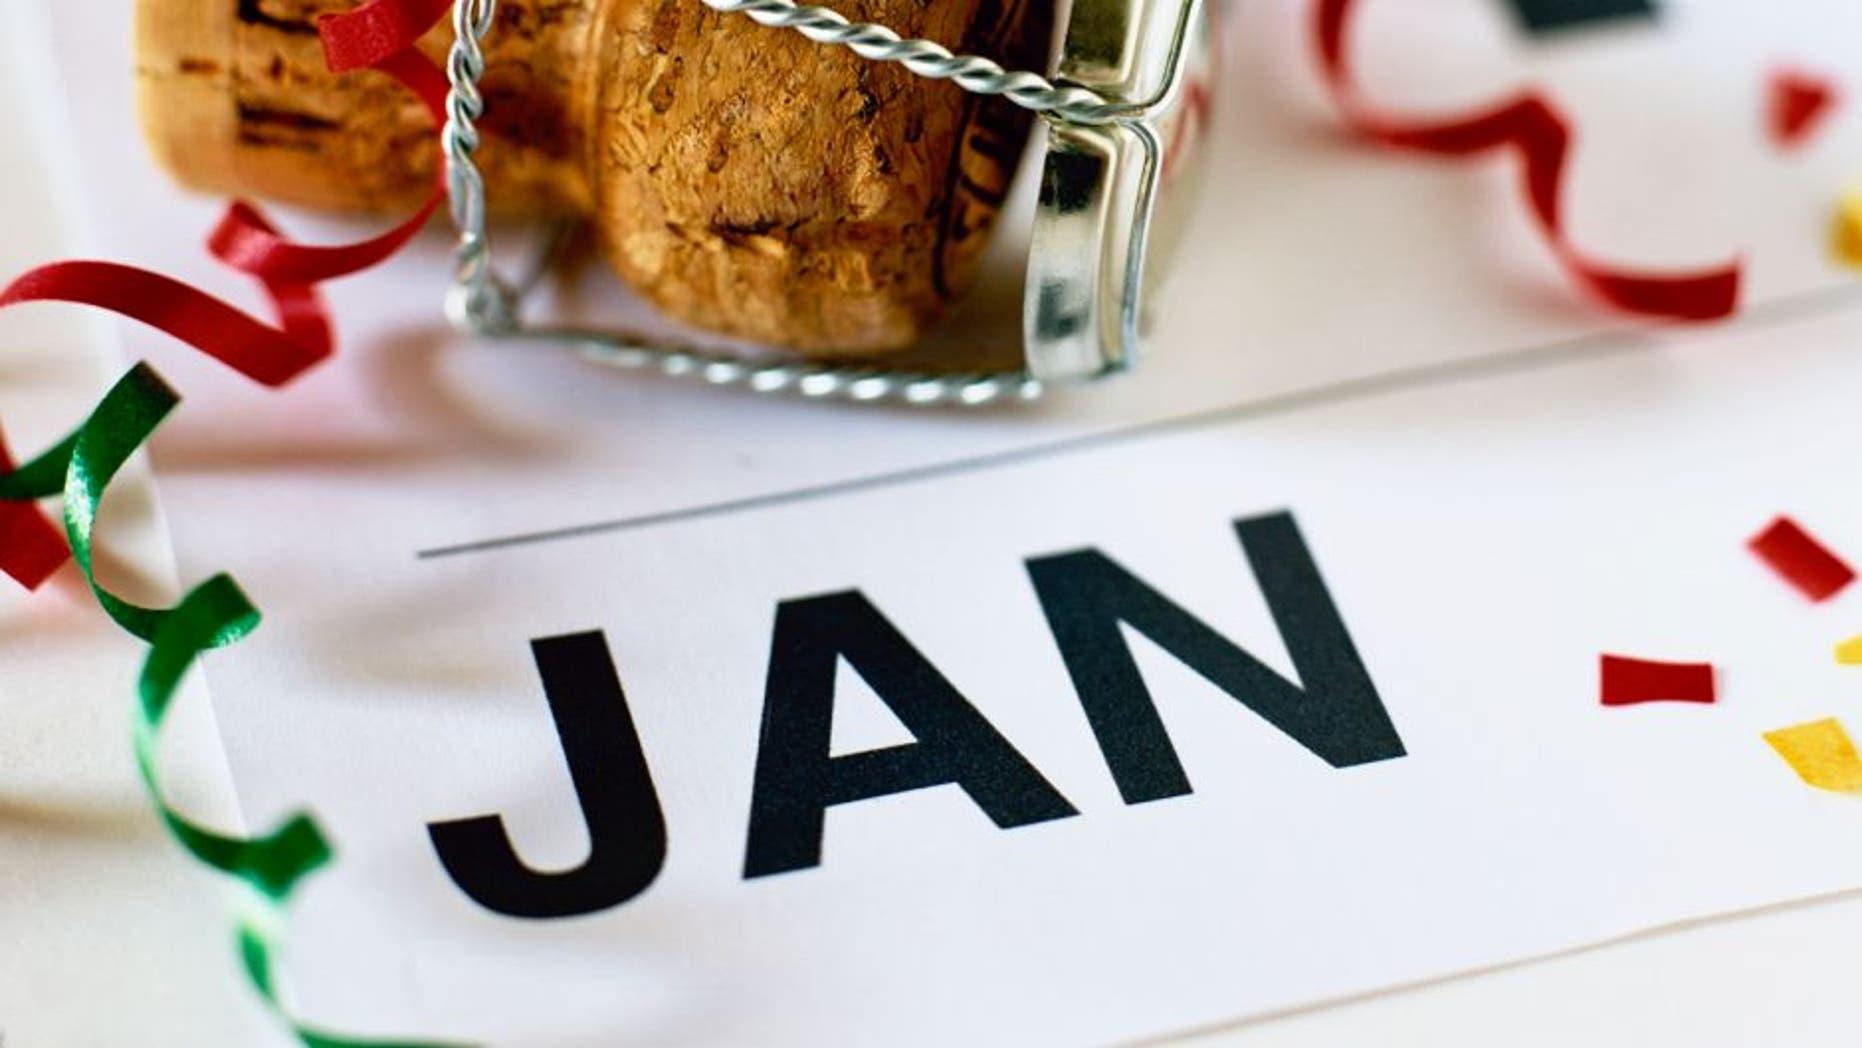 Cork and calendar